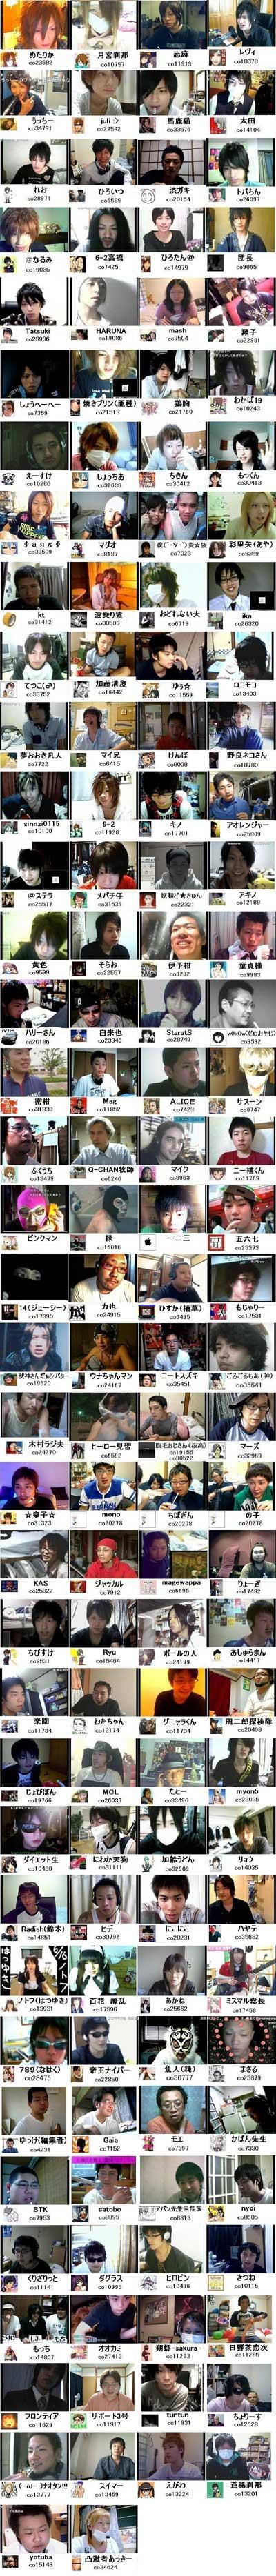 webcam_jpn_2.jpg